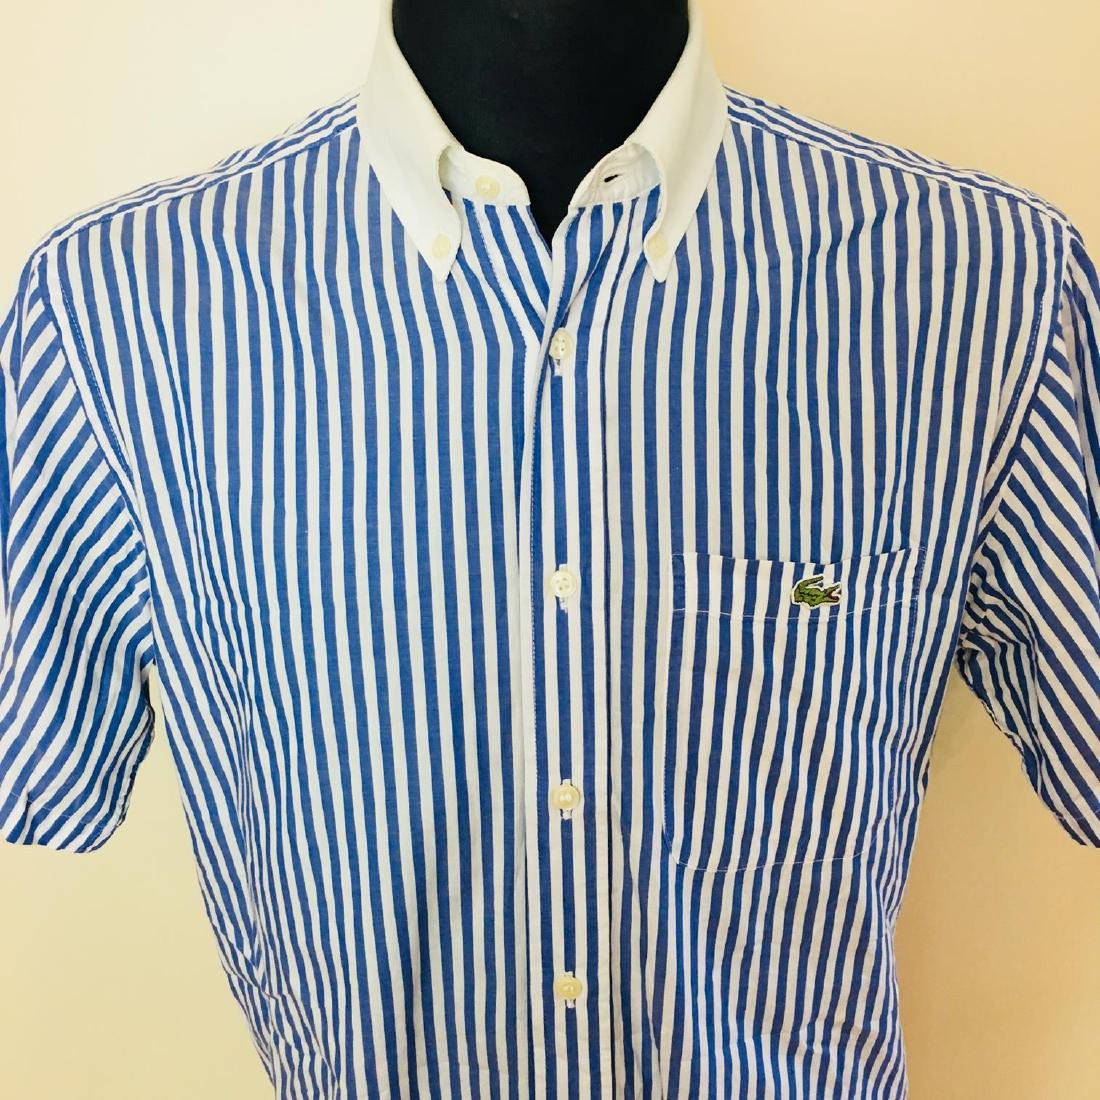 Men's Lacoste Blue Striped Short Sleeve Shirt Size 39 / - 3